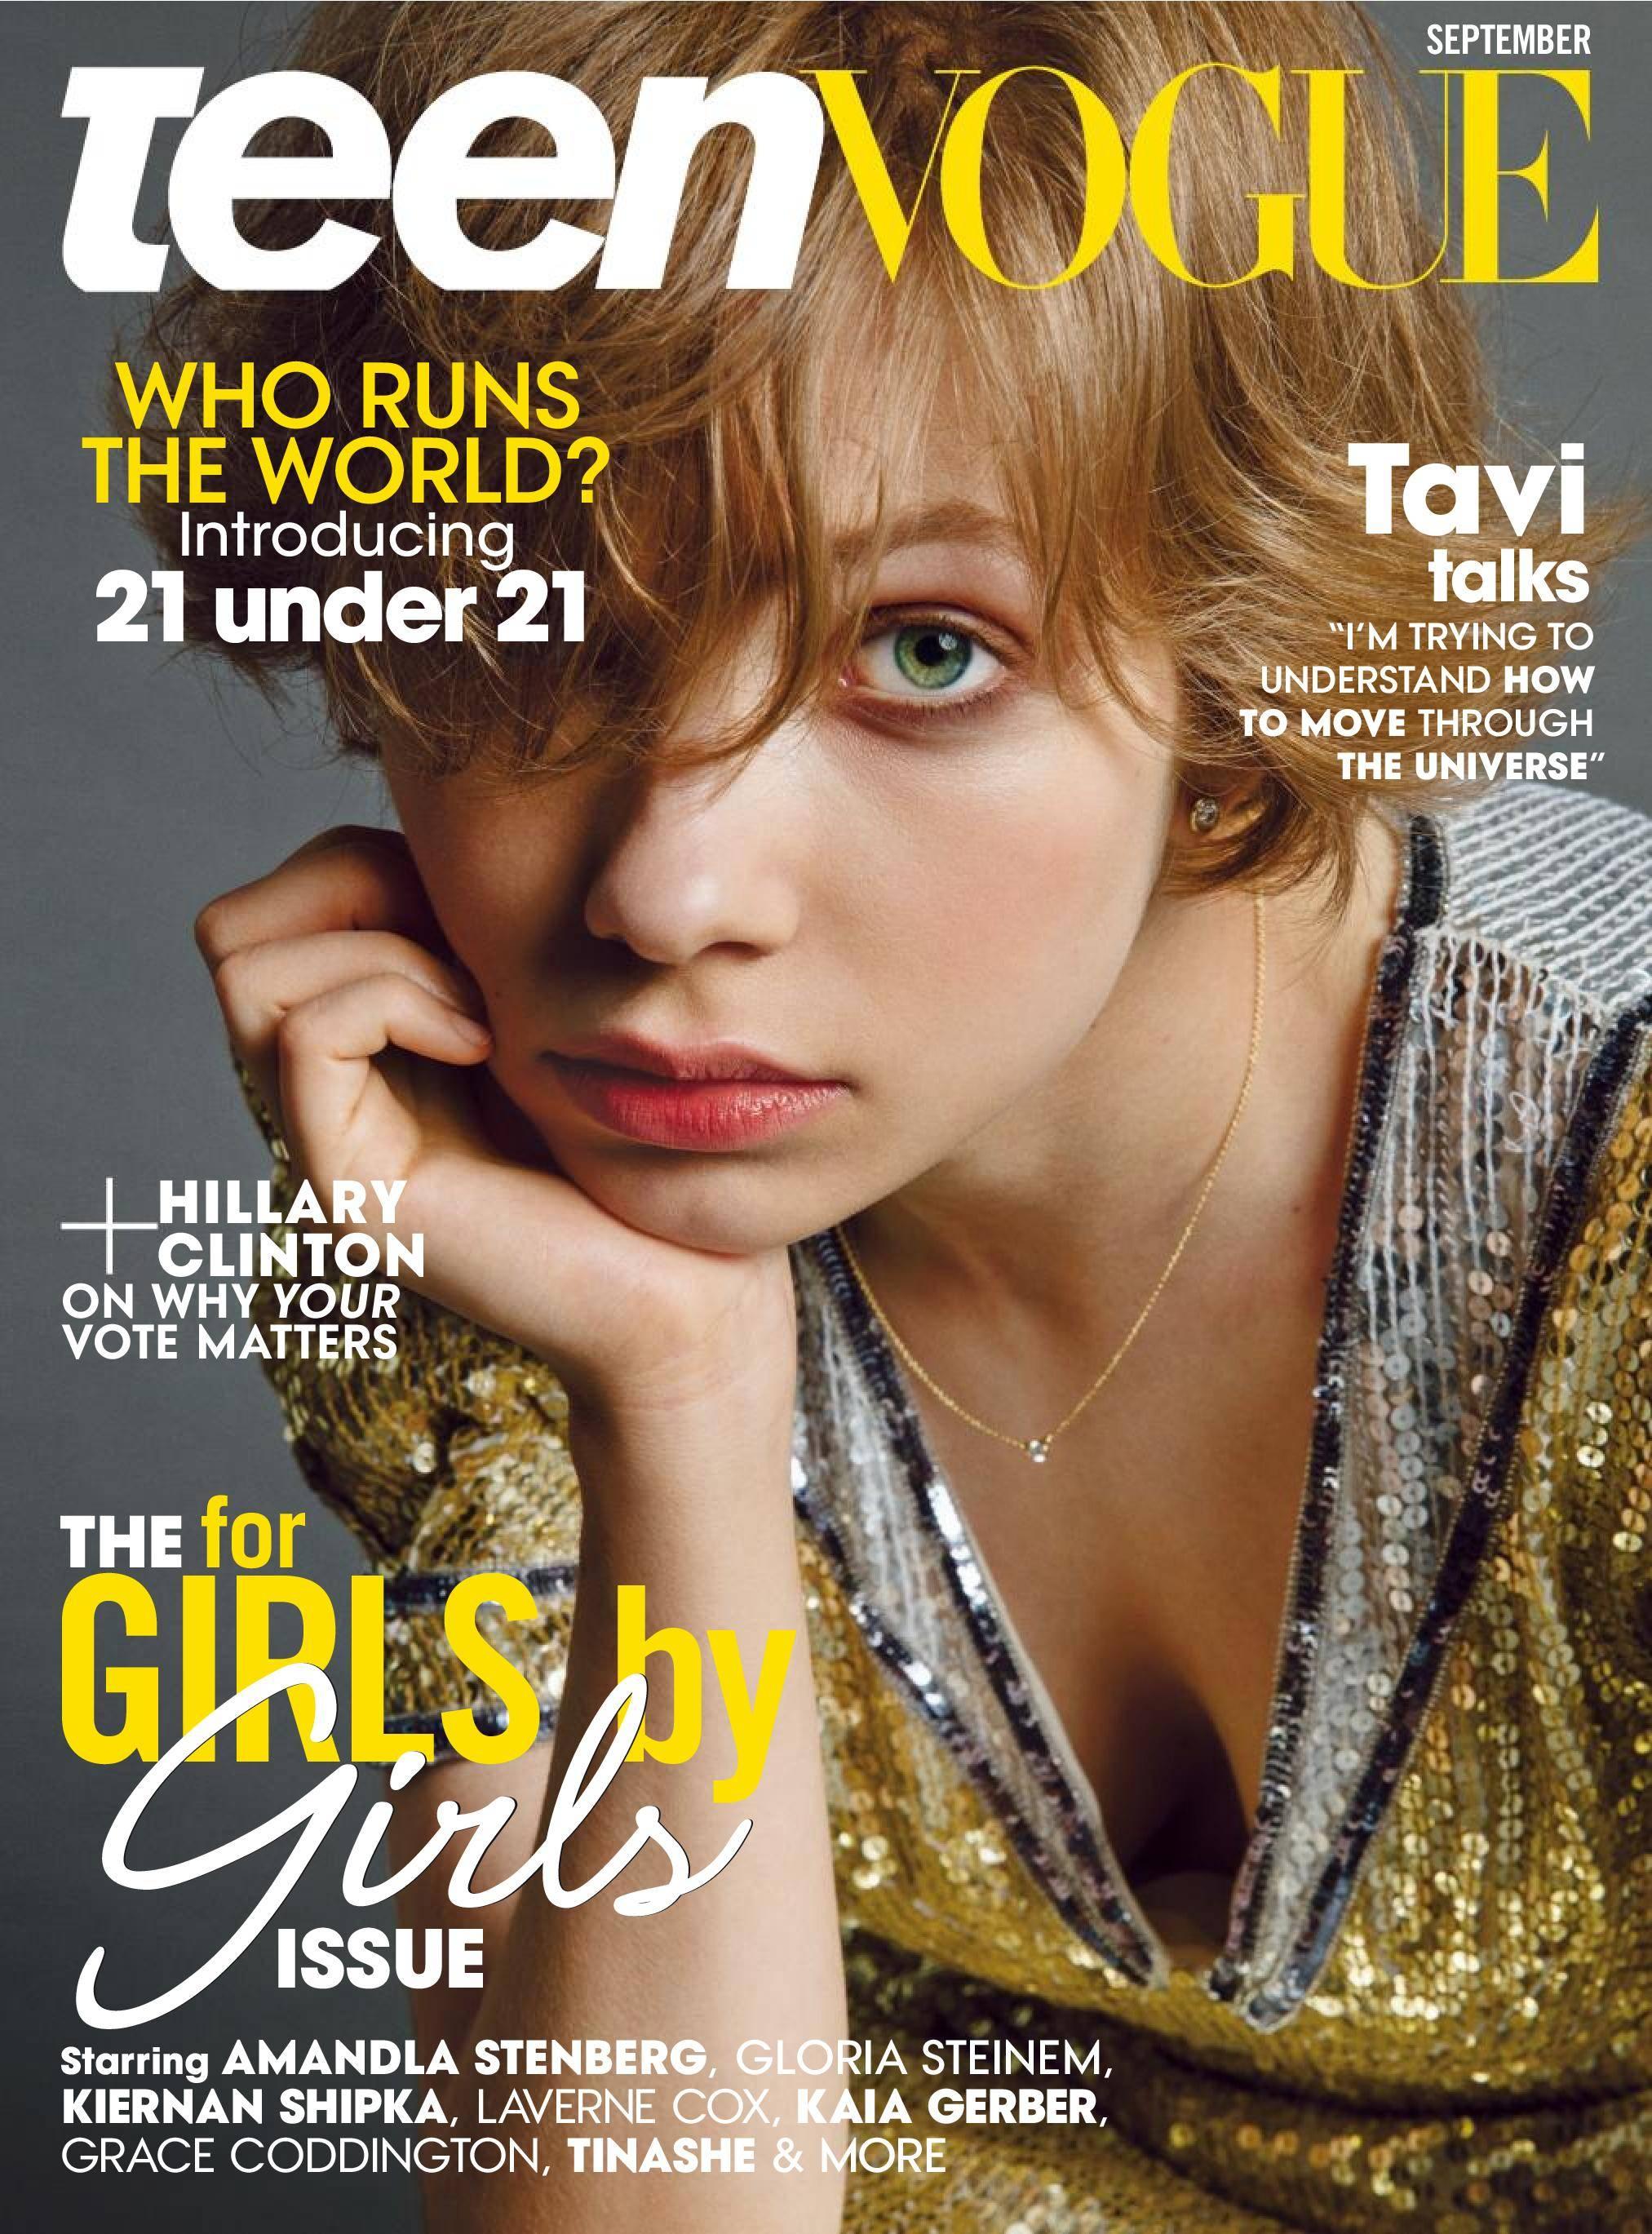 Vogue teen pics, nepali girls nude youtube